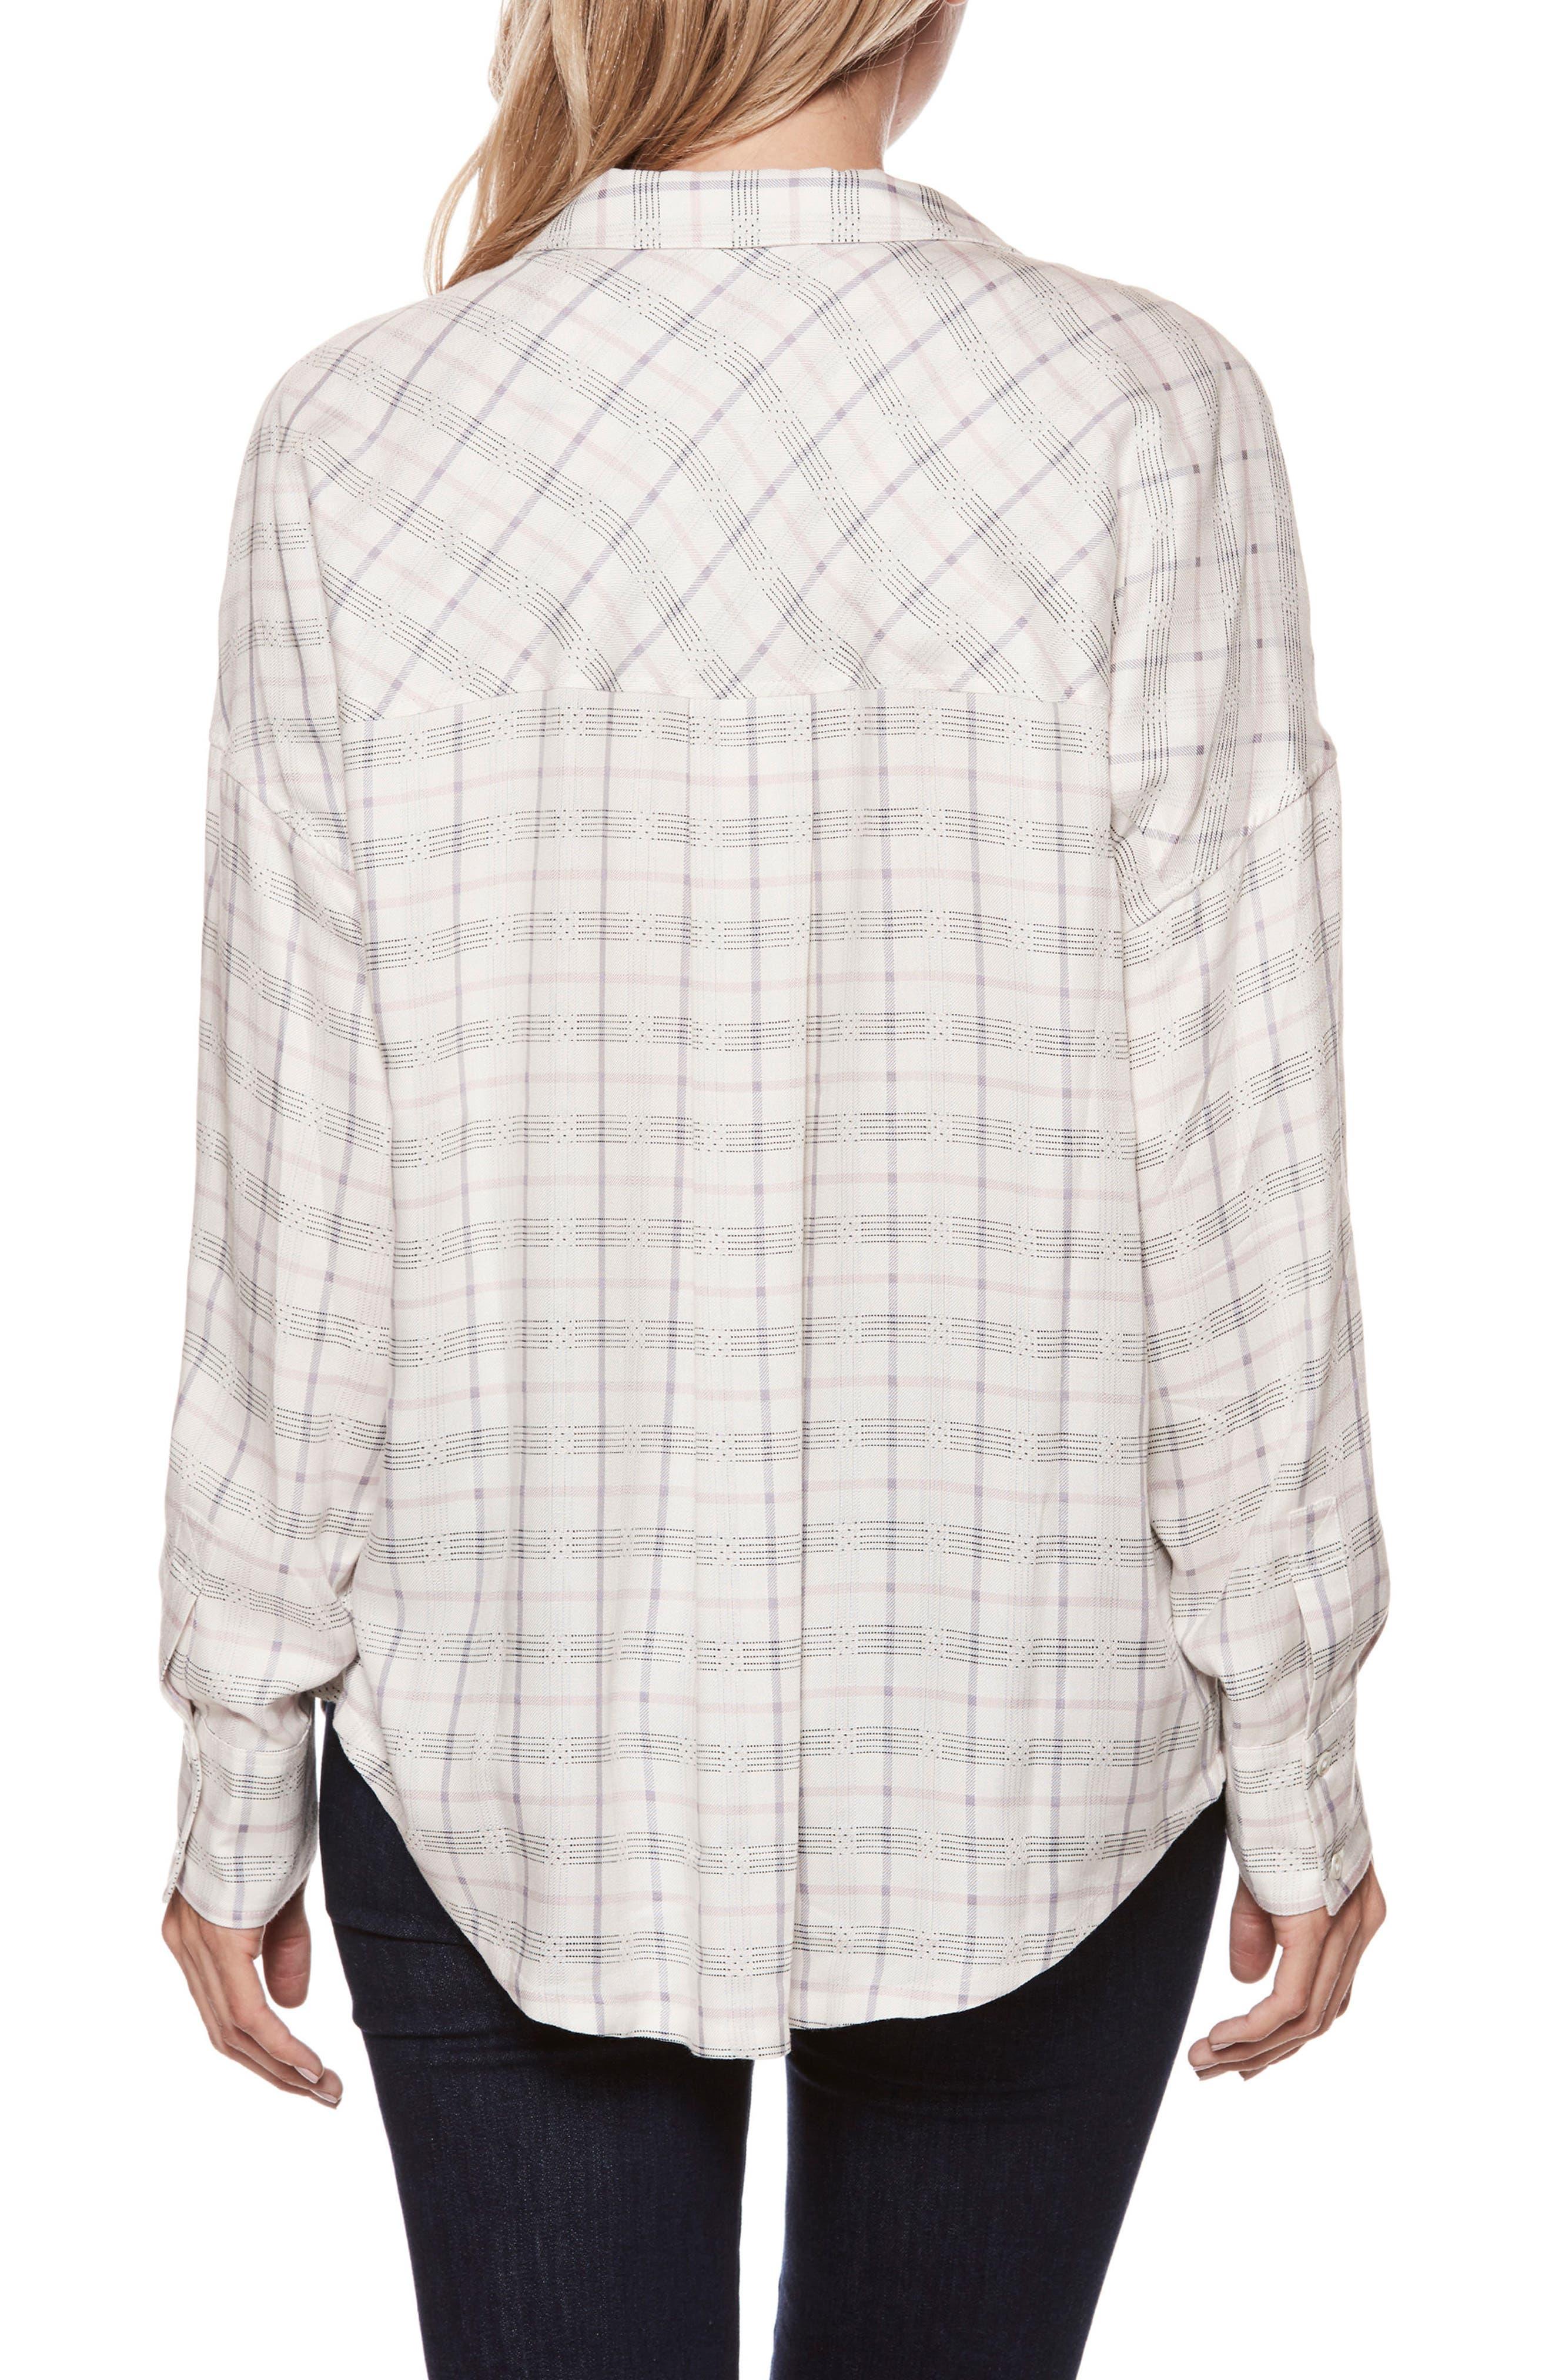 Delisa Check Shirt,                             Alternate thumbnail 3, color,                             White/ Lilac